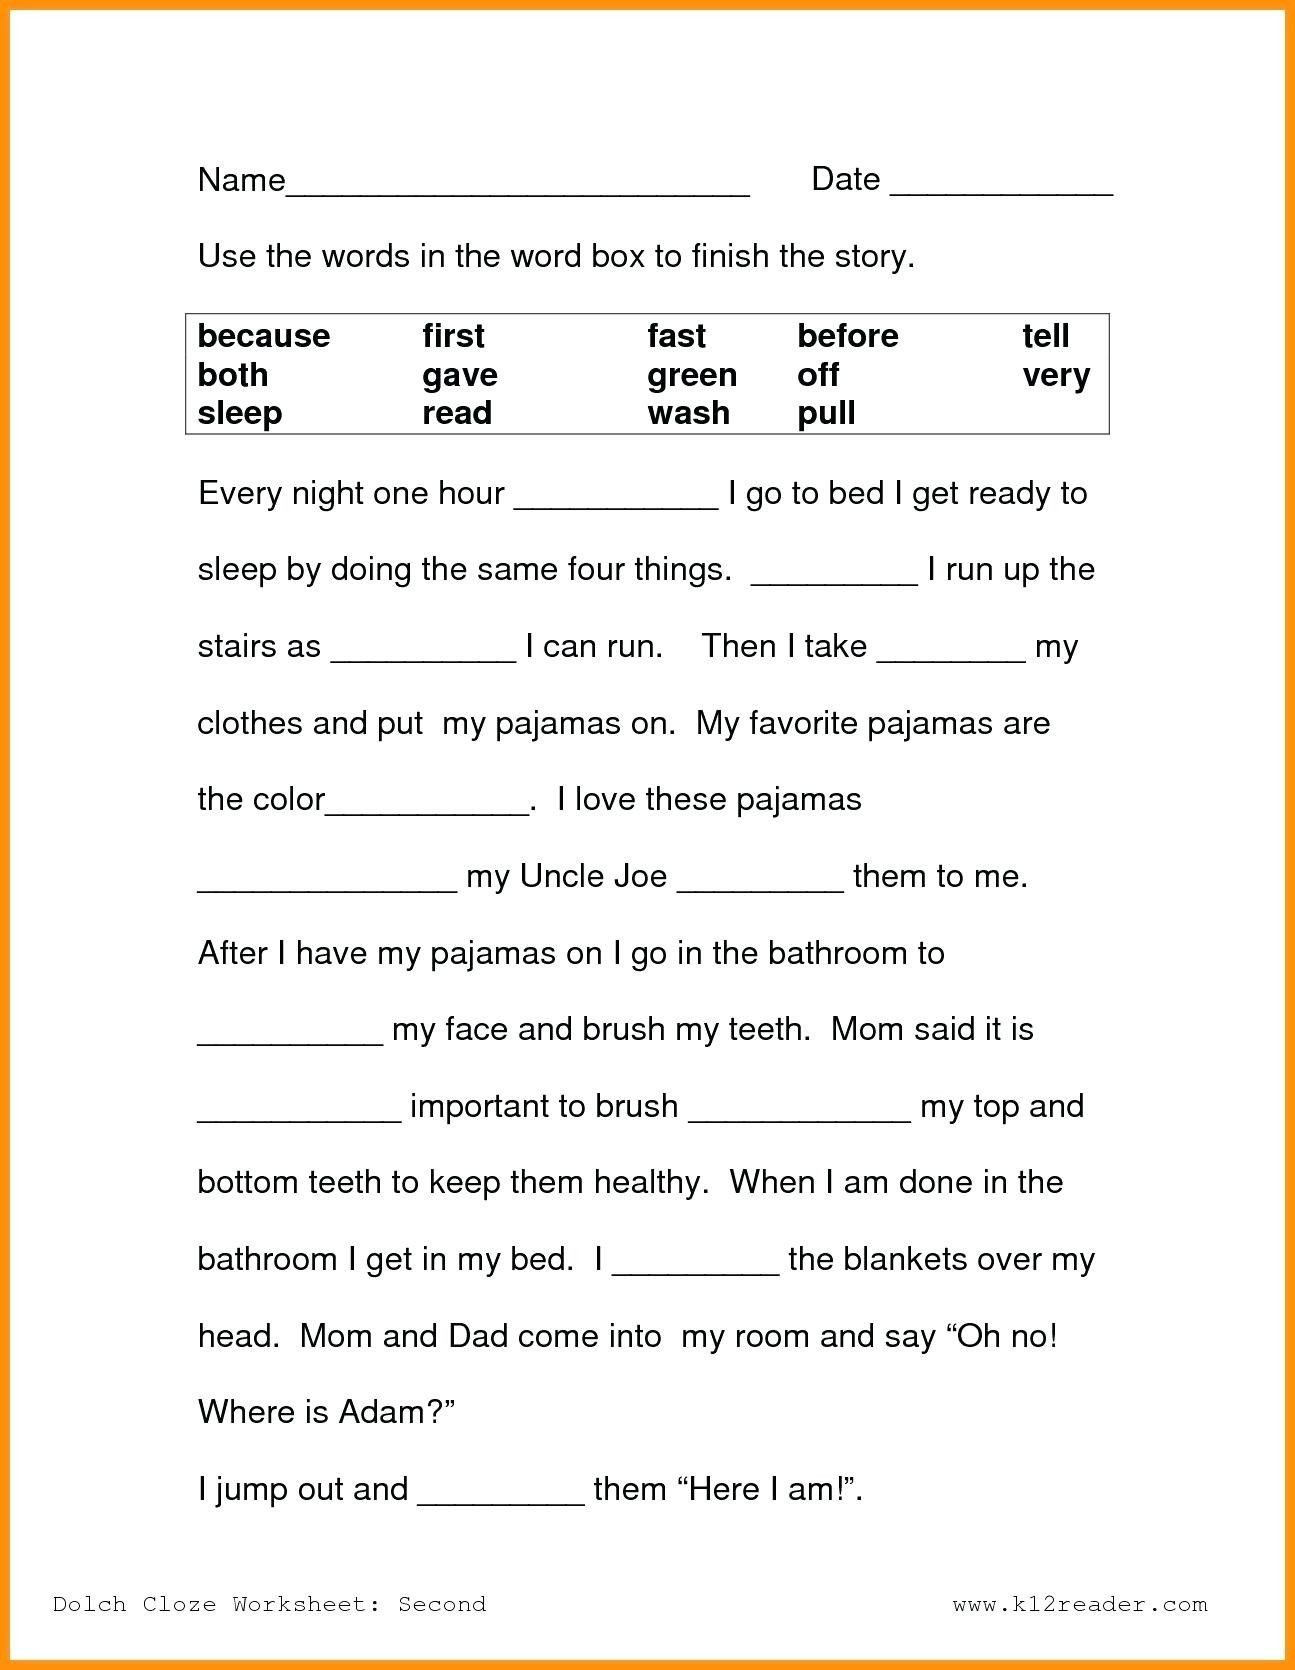 medium resolution of Winston Grammar 6th Grade Worksheet Printable   Printable Worksheets and  Activities for Teachers